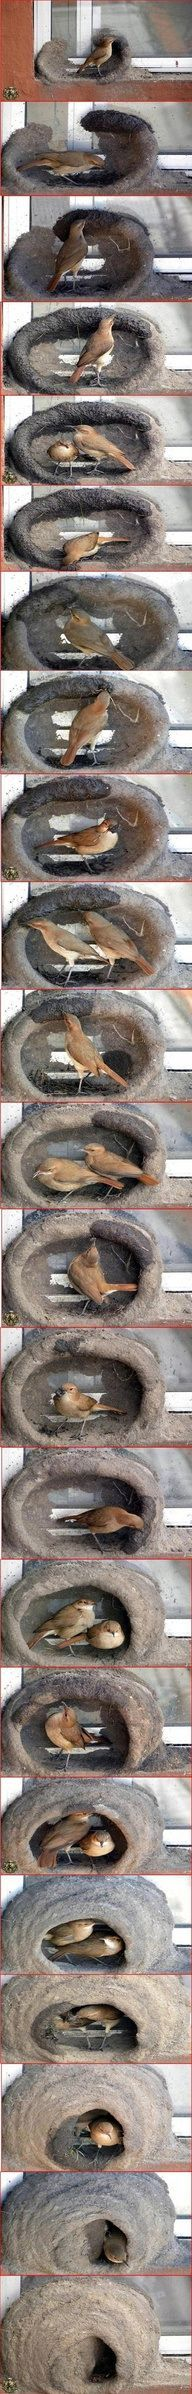 Hornero bird nest building..amazing